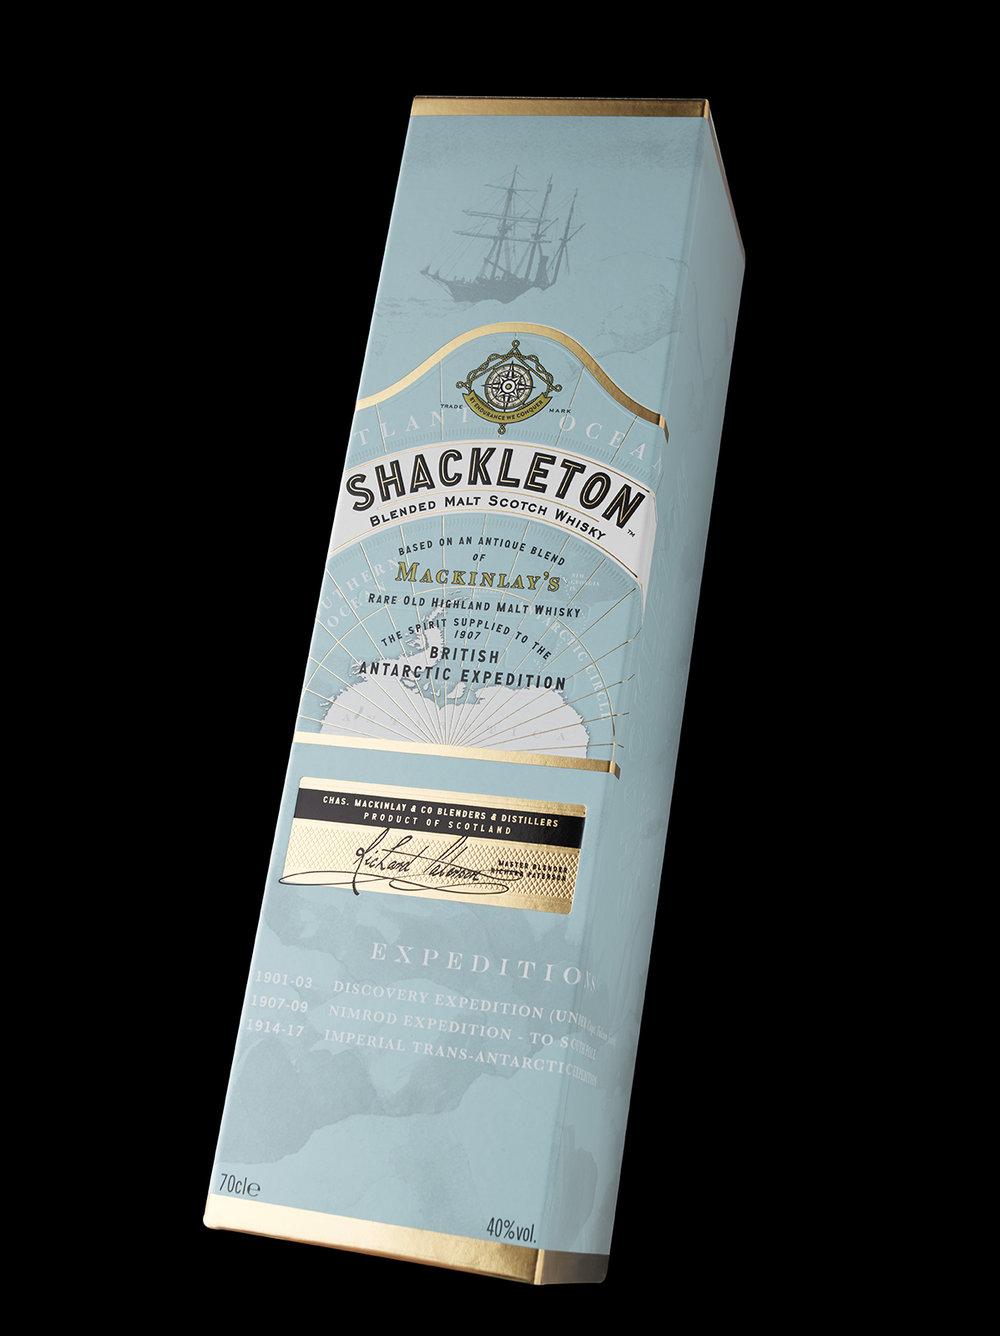 Shackleton_box_angled_on_black.jpg